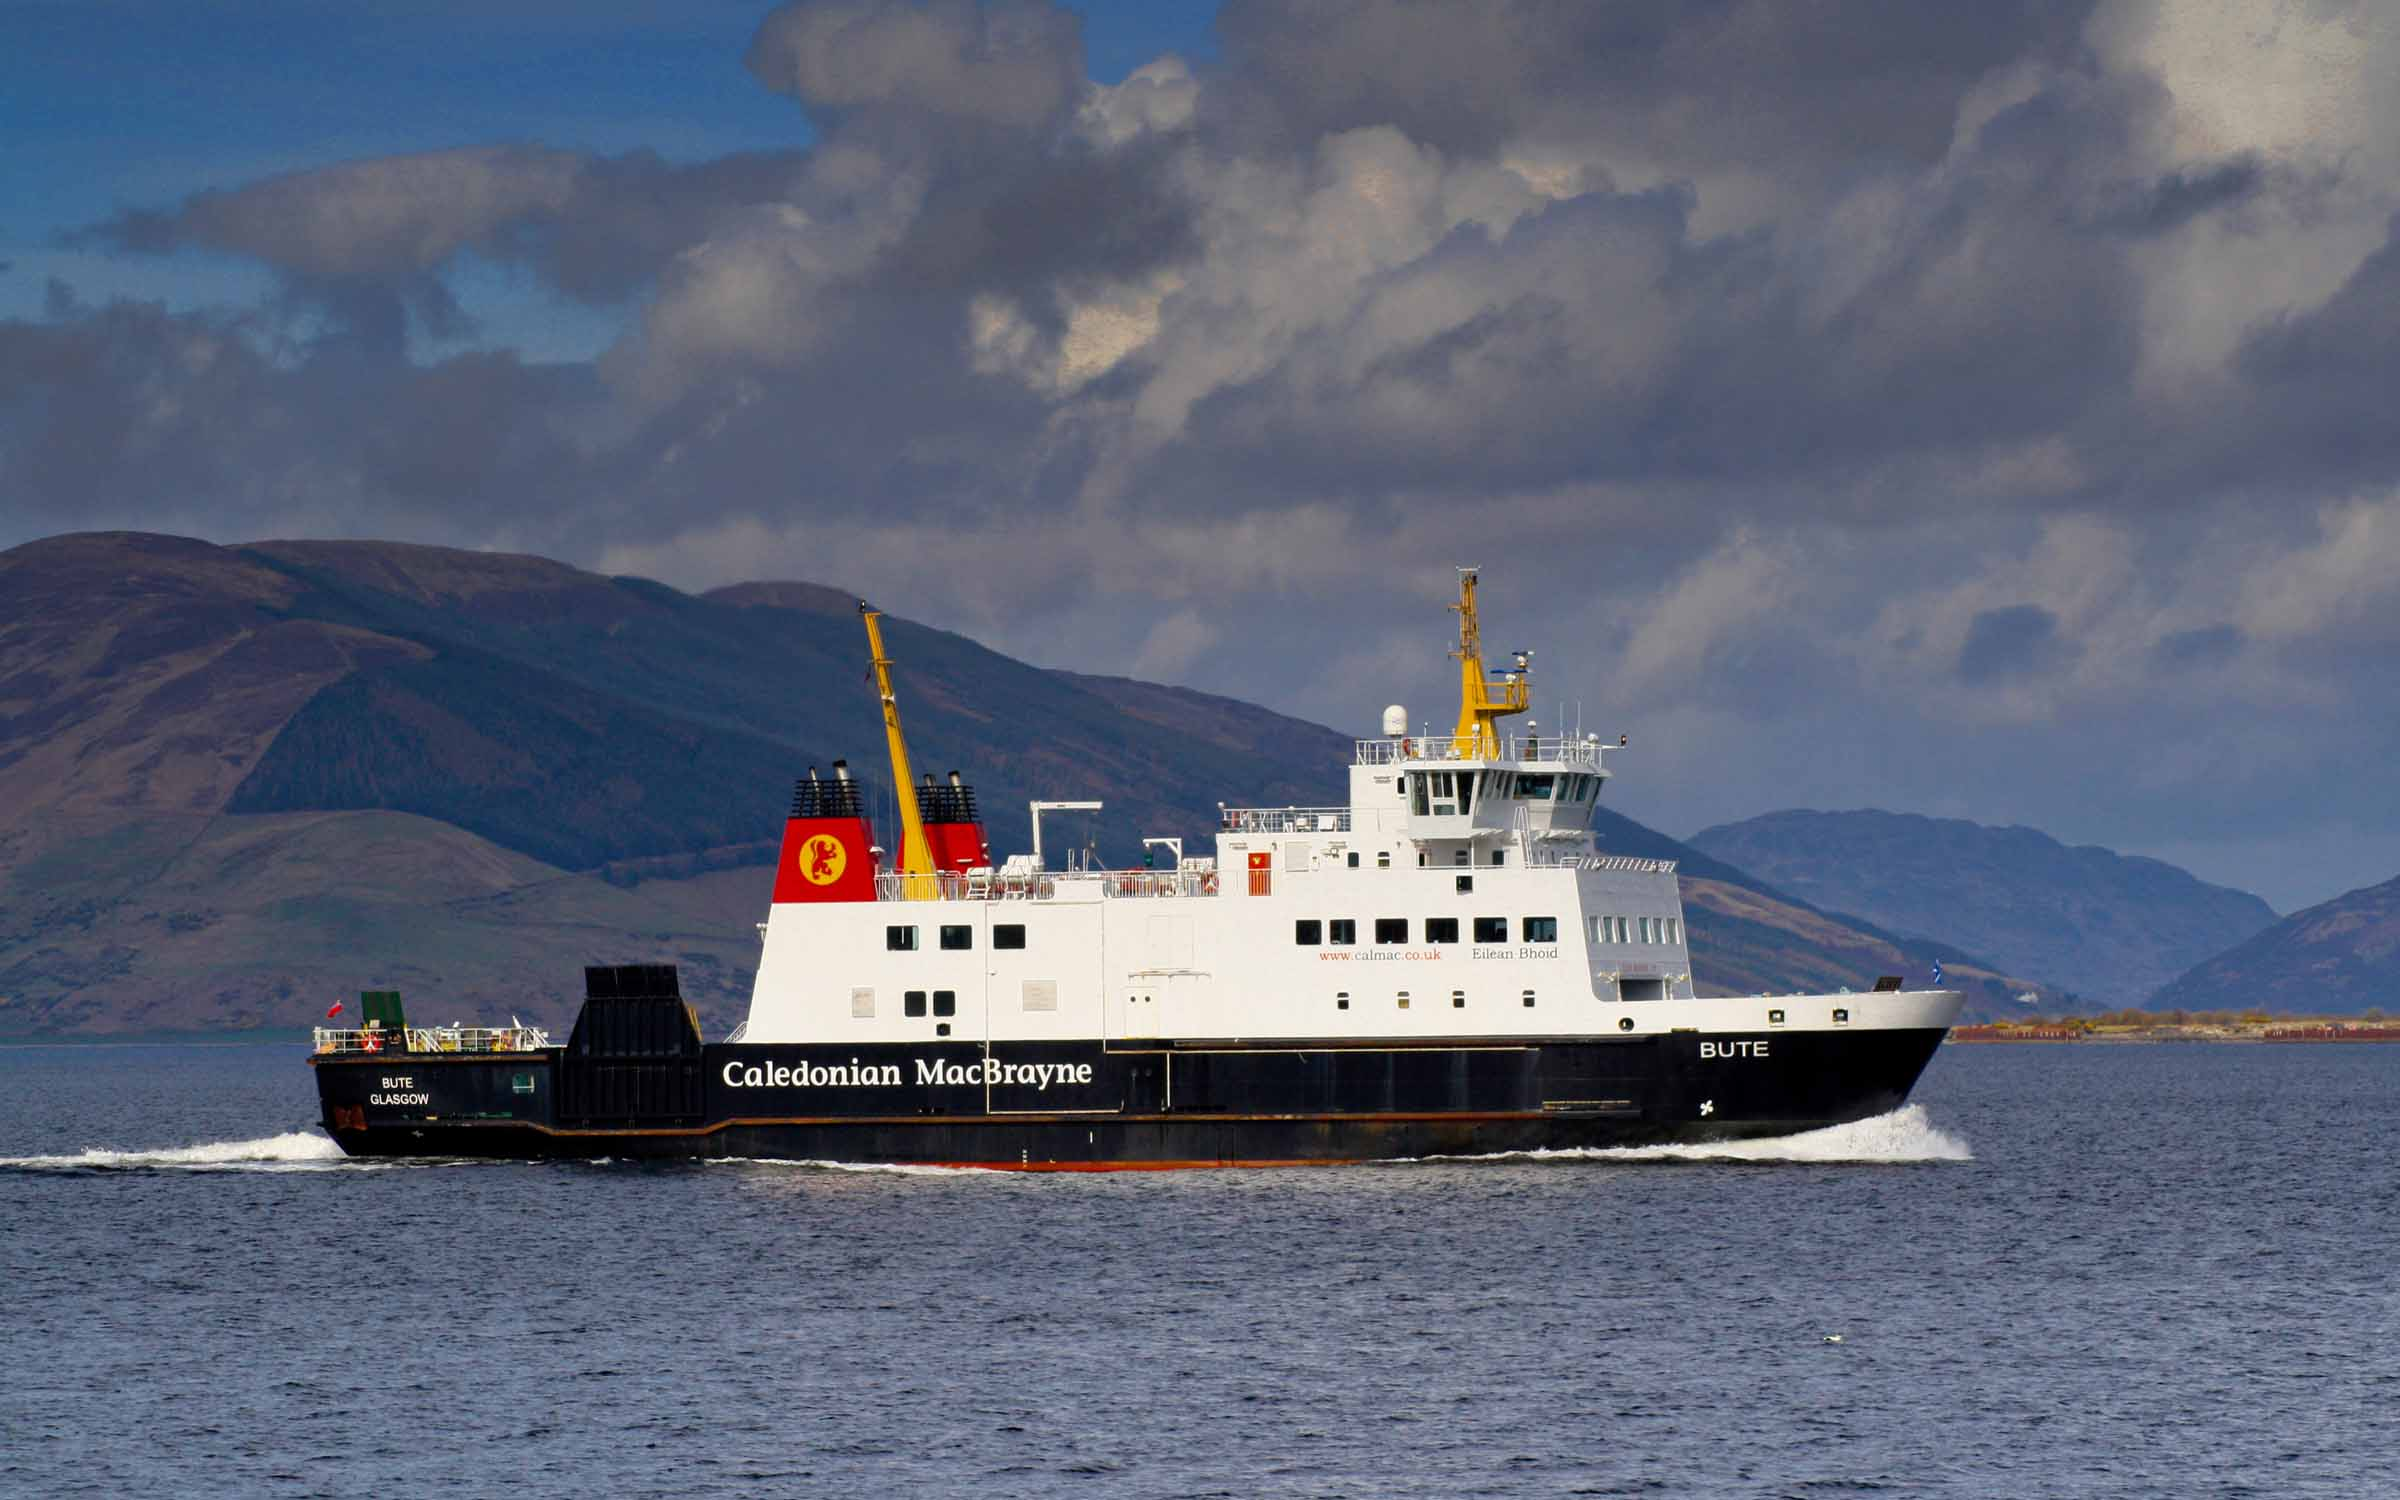 Bute passing Craigmore (Ships of CalMac)